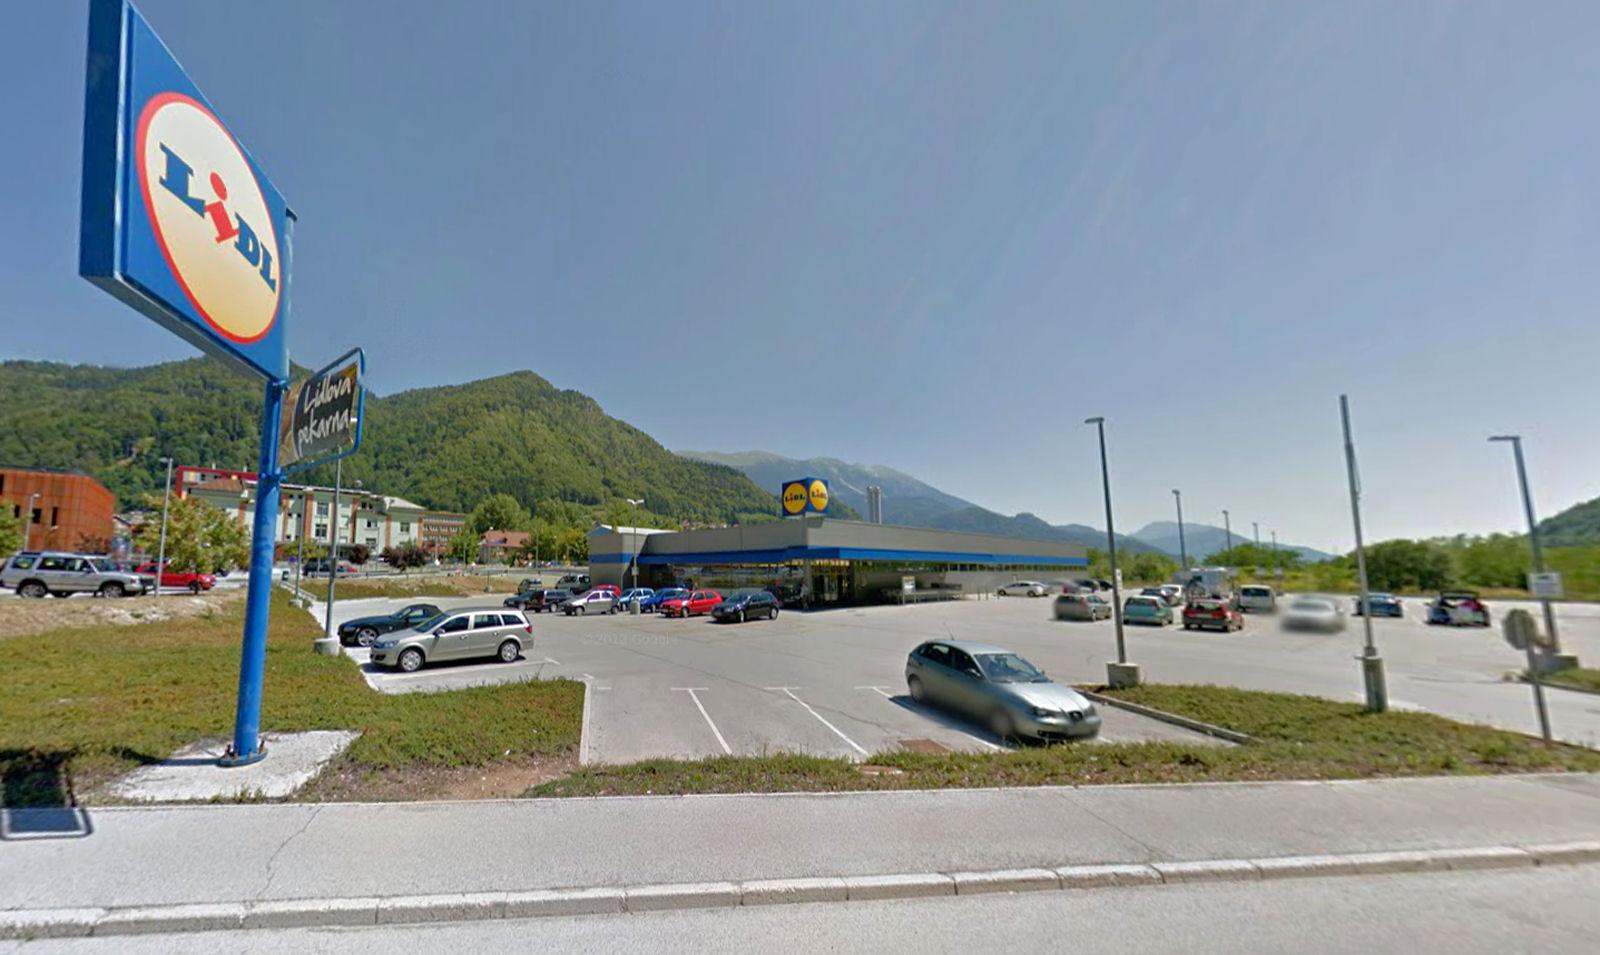 Lidl supermarket in Jesenice, Slovenia